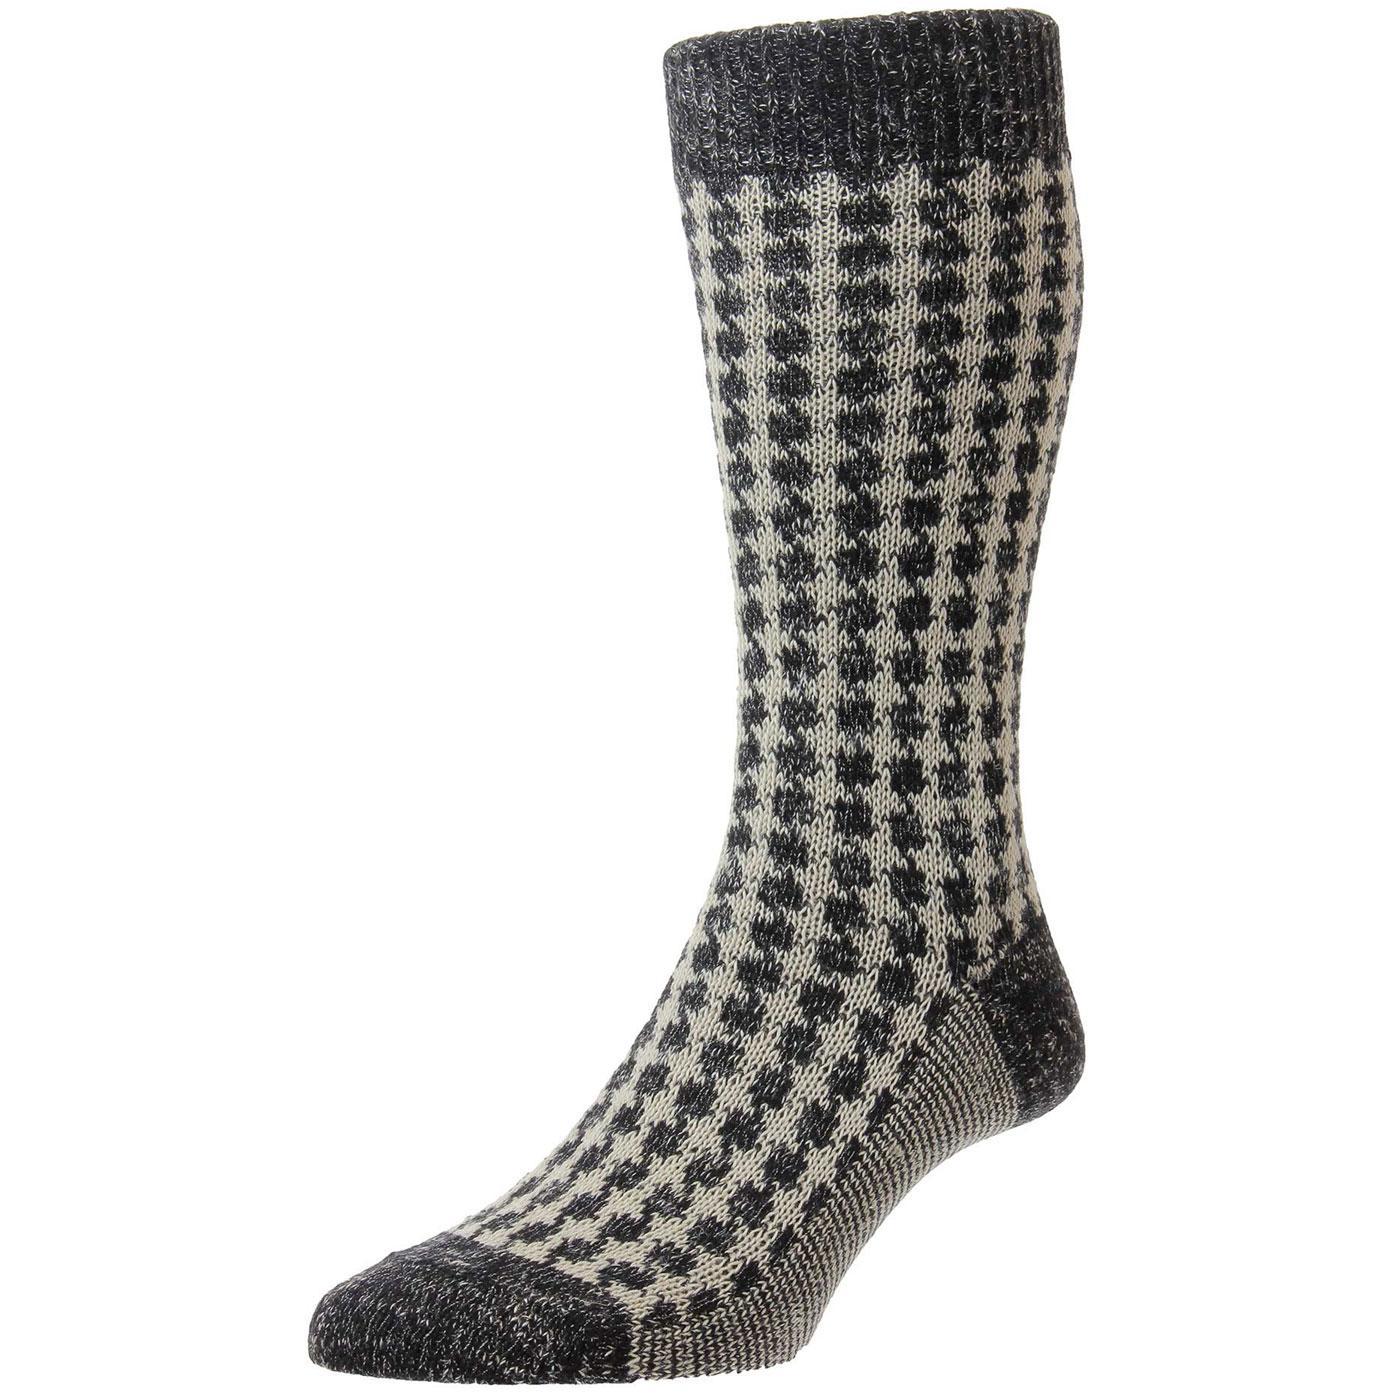 + Hoyland PANTHERELLA Houndstooth Cashmere Socks